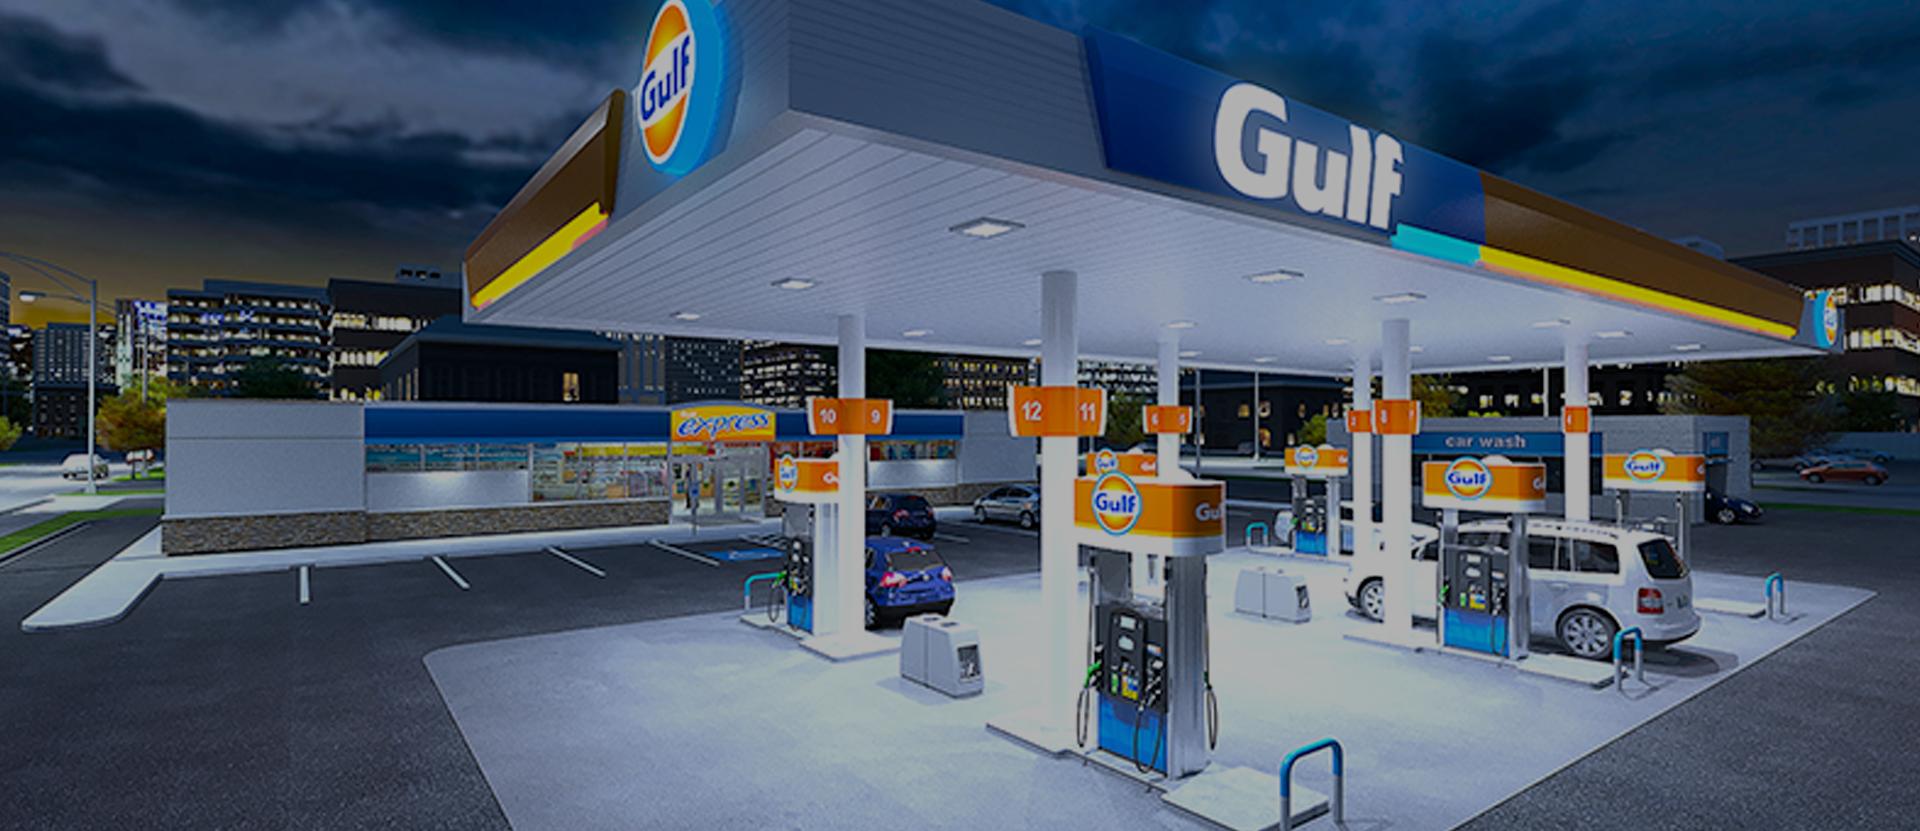 Gulf-Gilbarco-forecourt